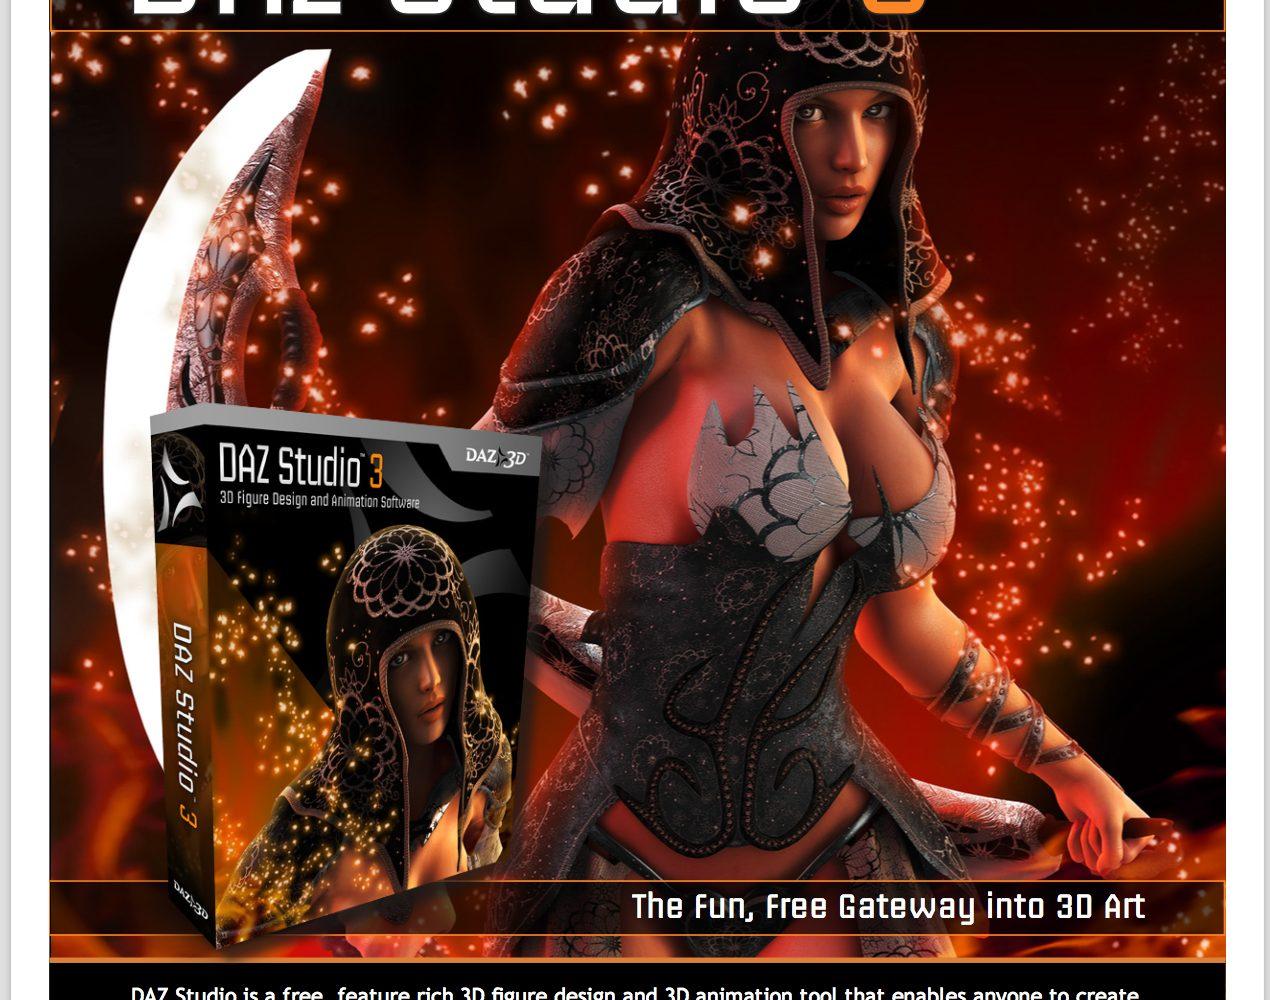 Daz Studio Promotional Flyer Front